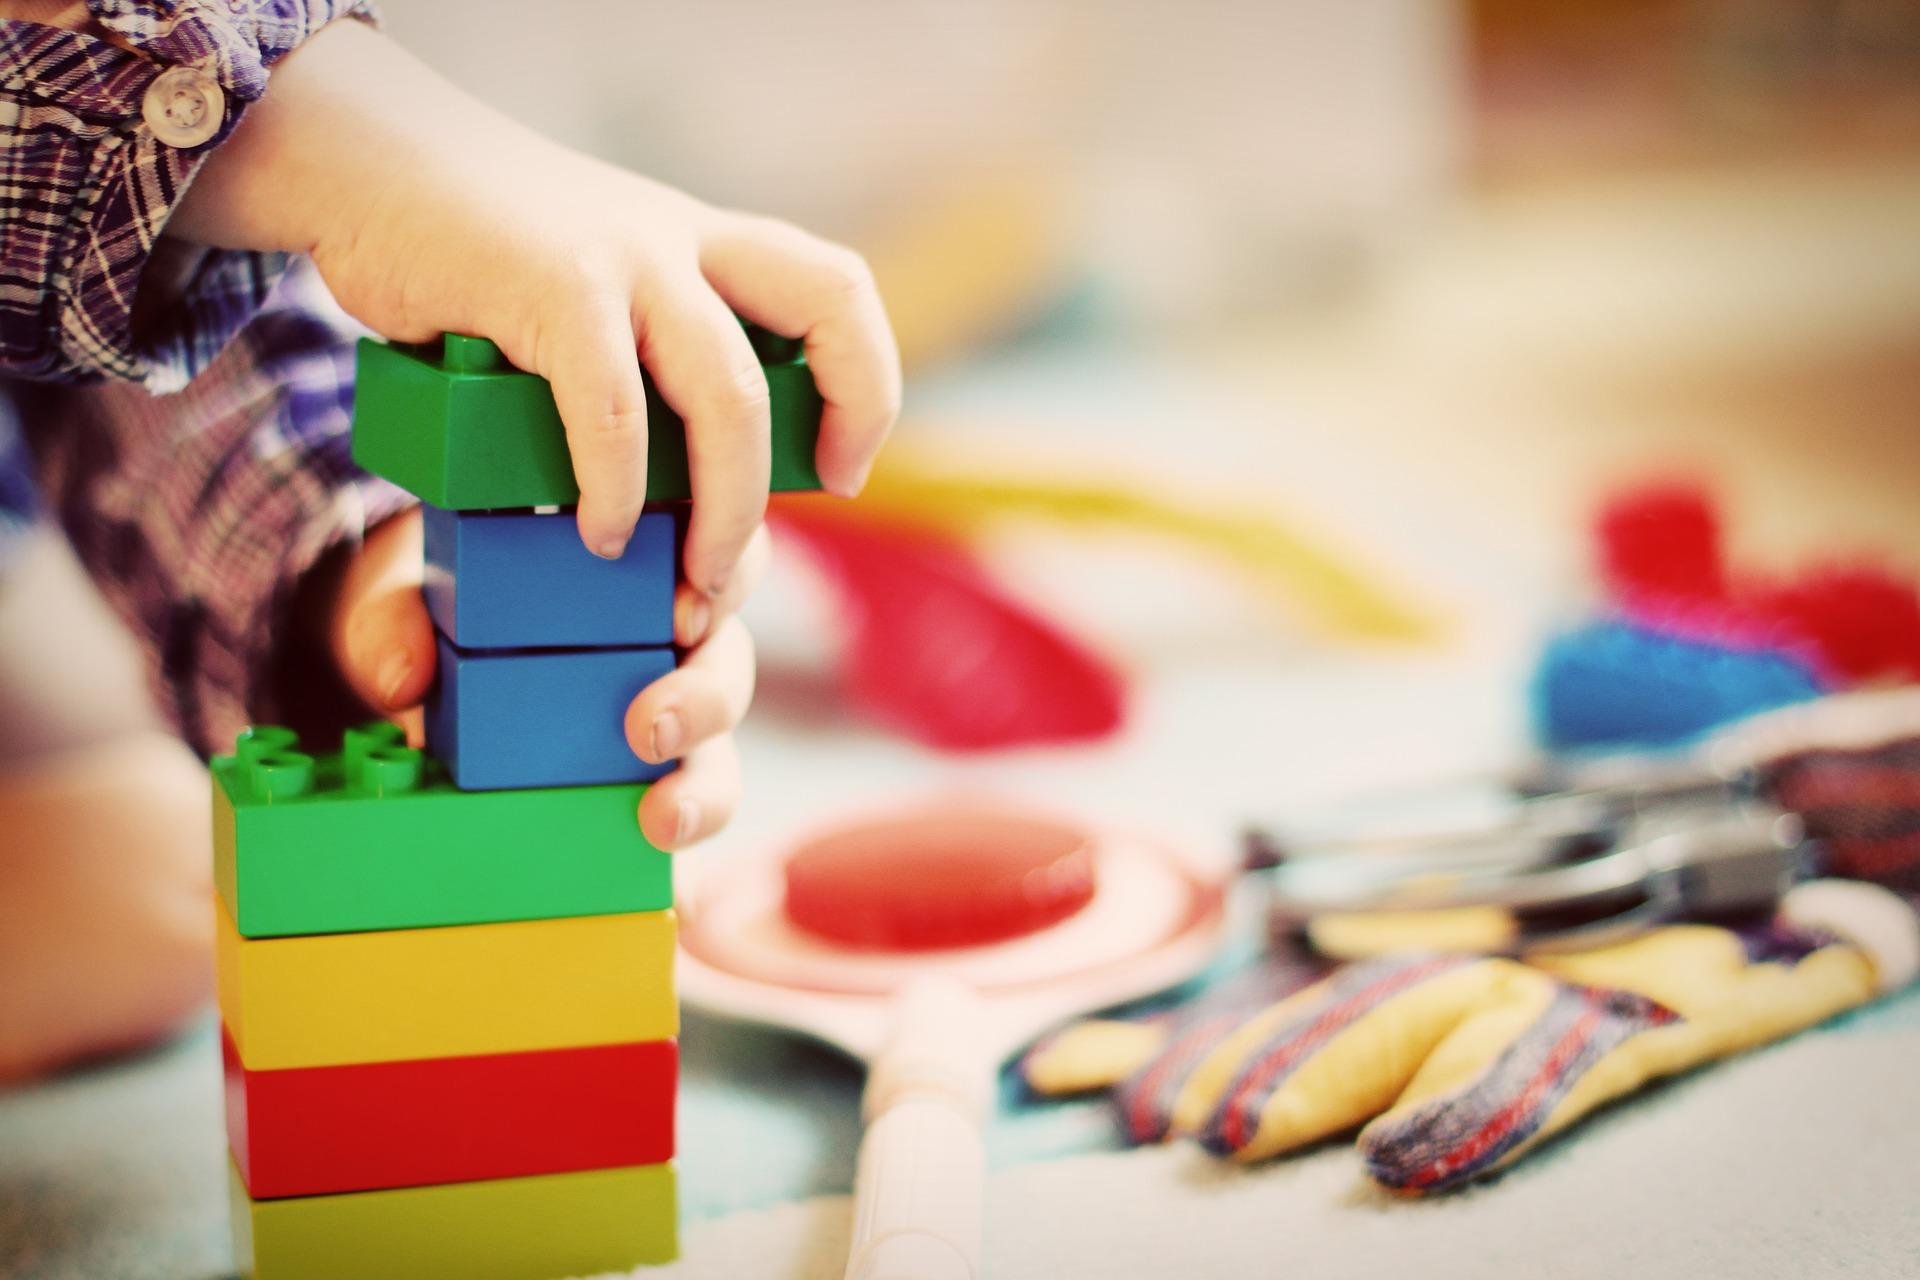 Kita Kinderbetreuung Beitragsfreiheit